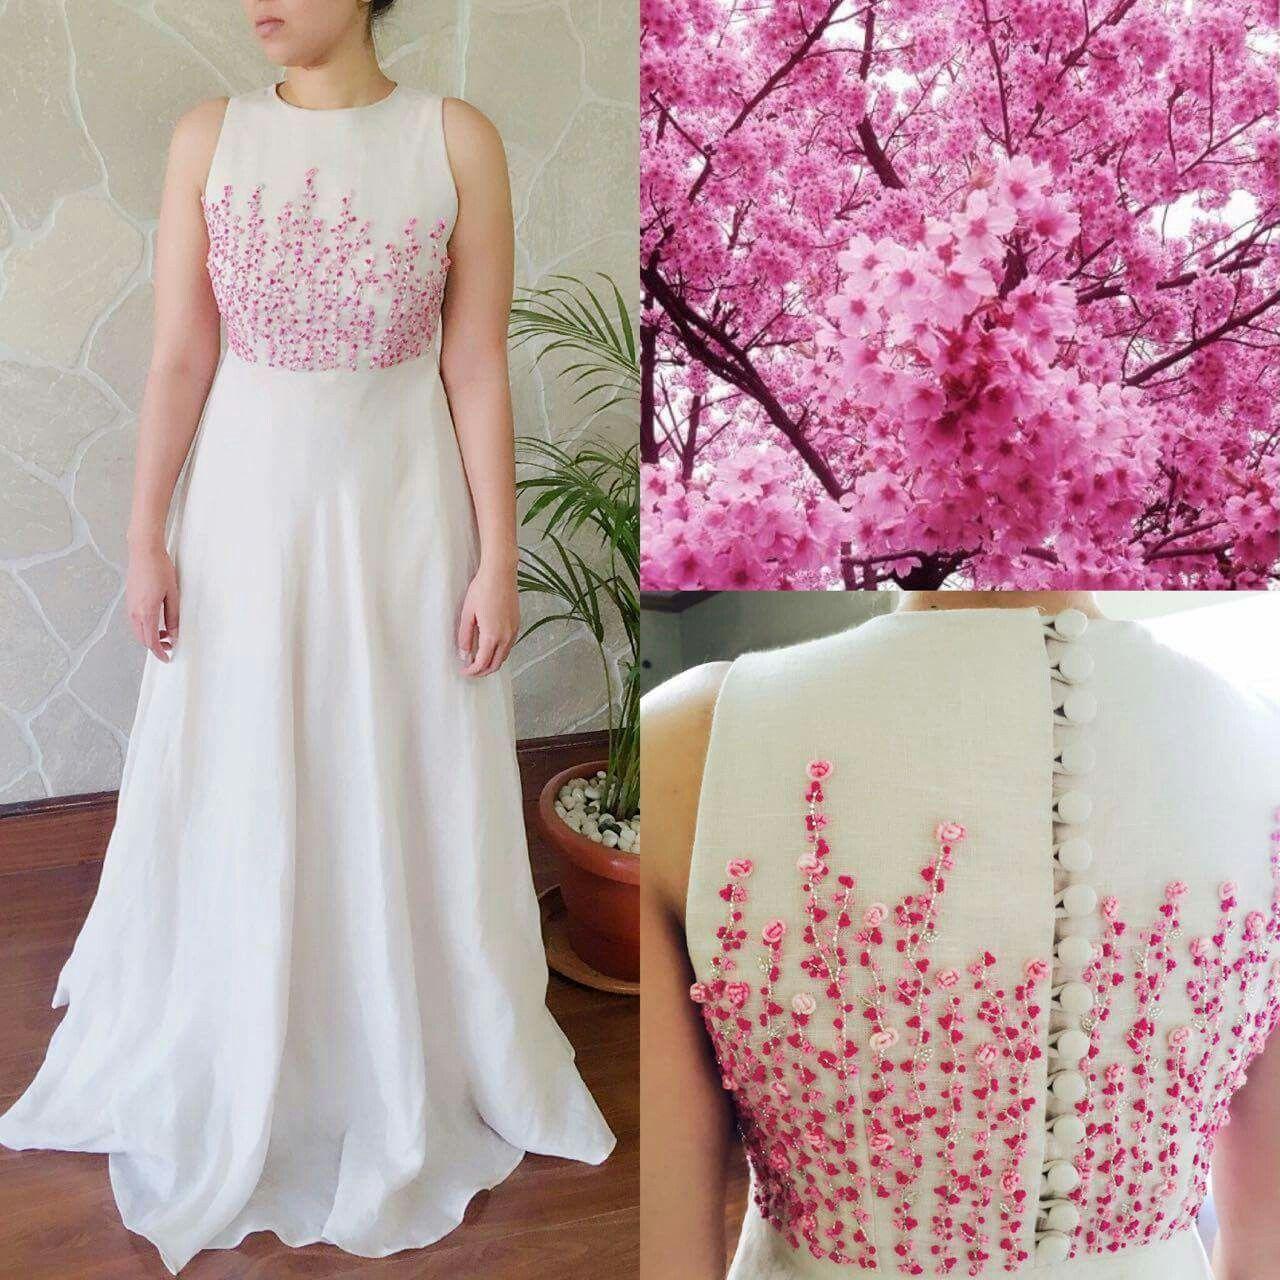 French knot ideaaa | Dresses | Pinterest | Sumo, Bordado y Falda